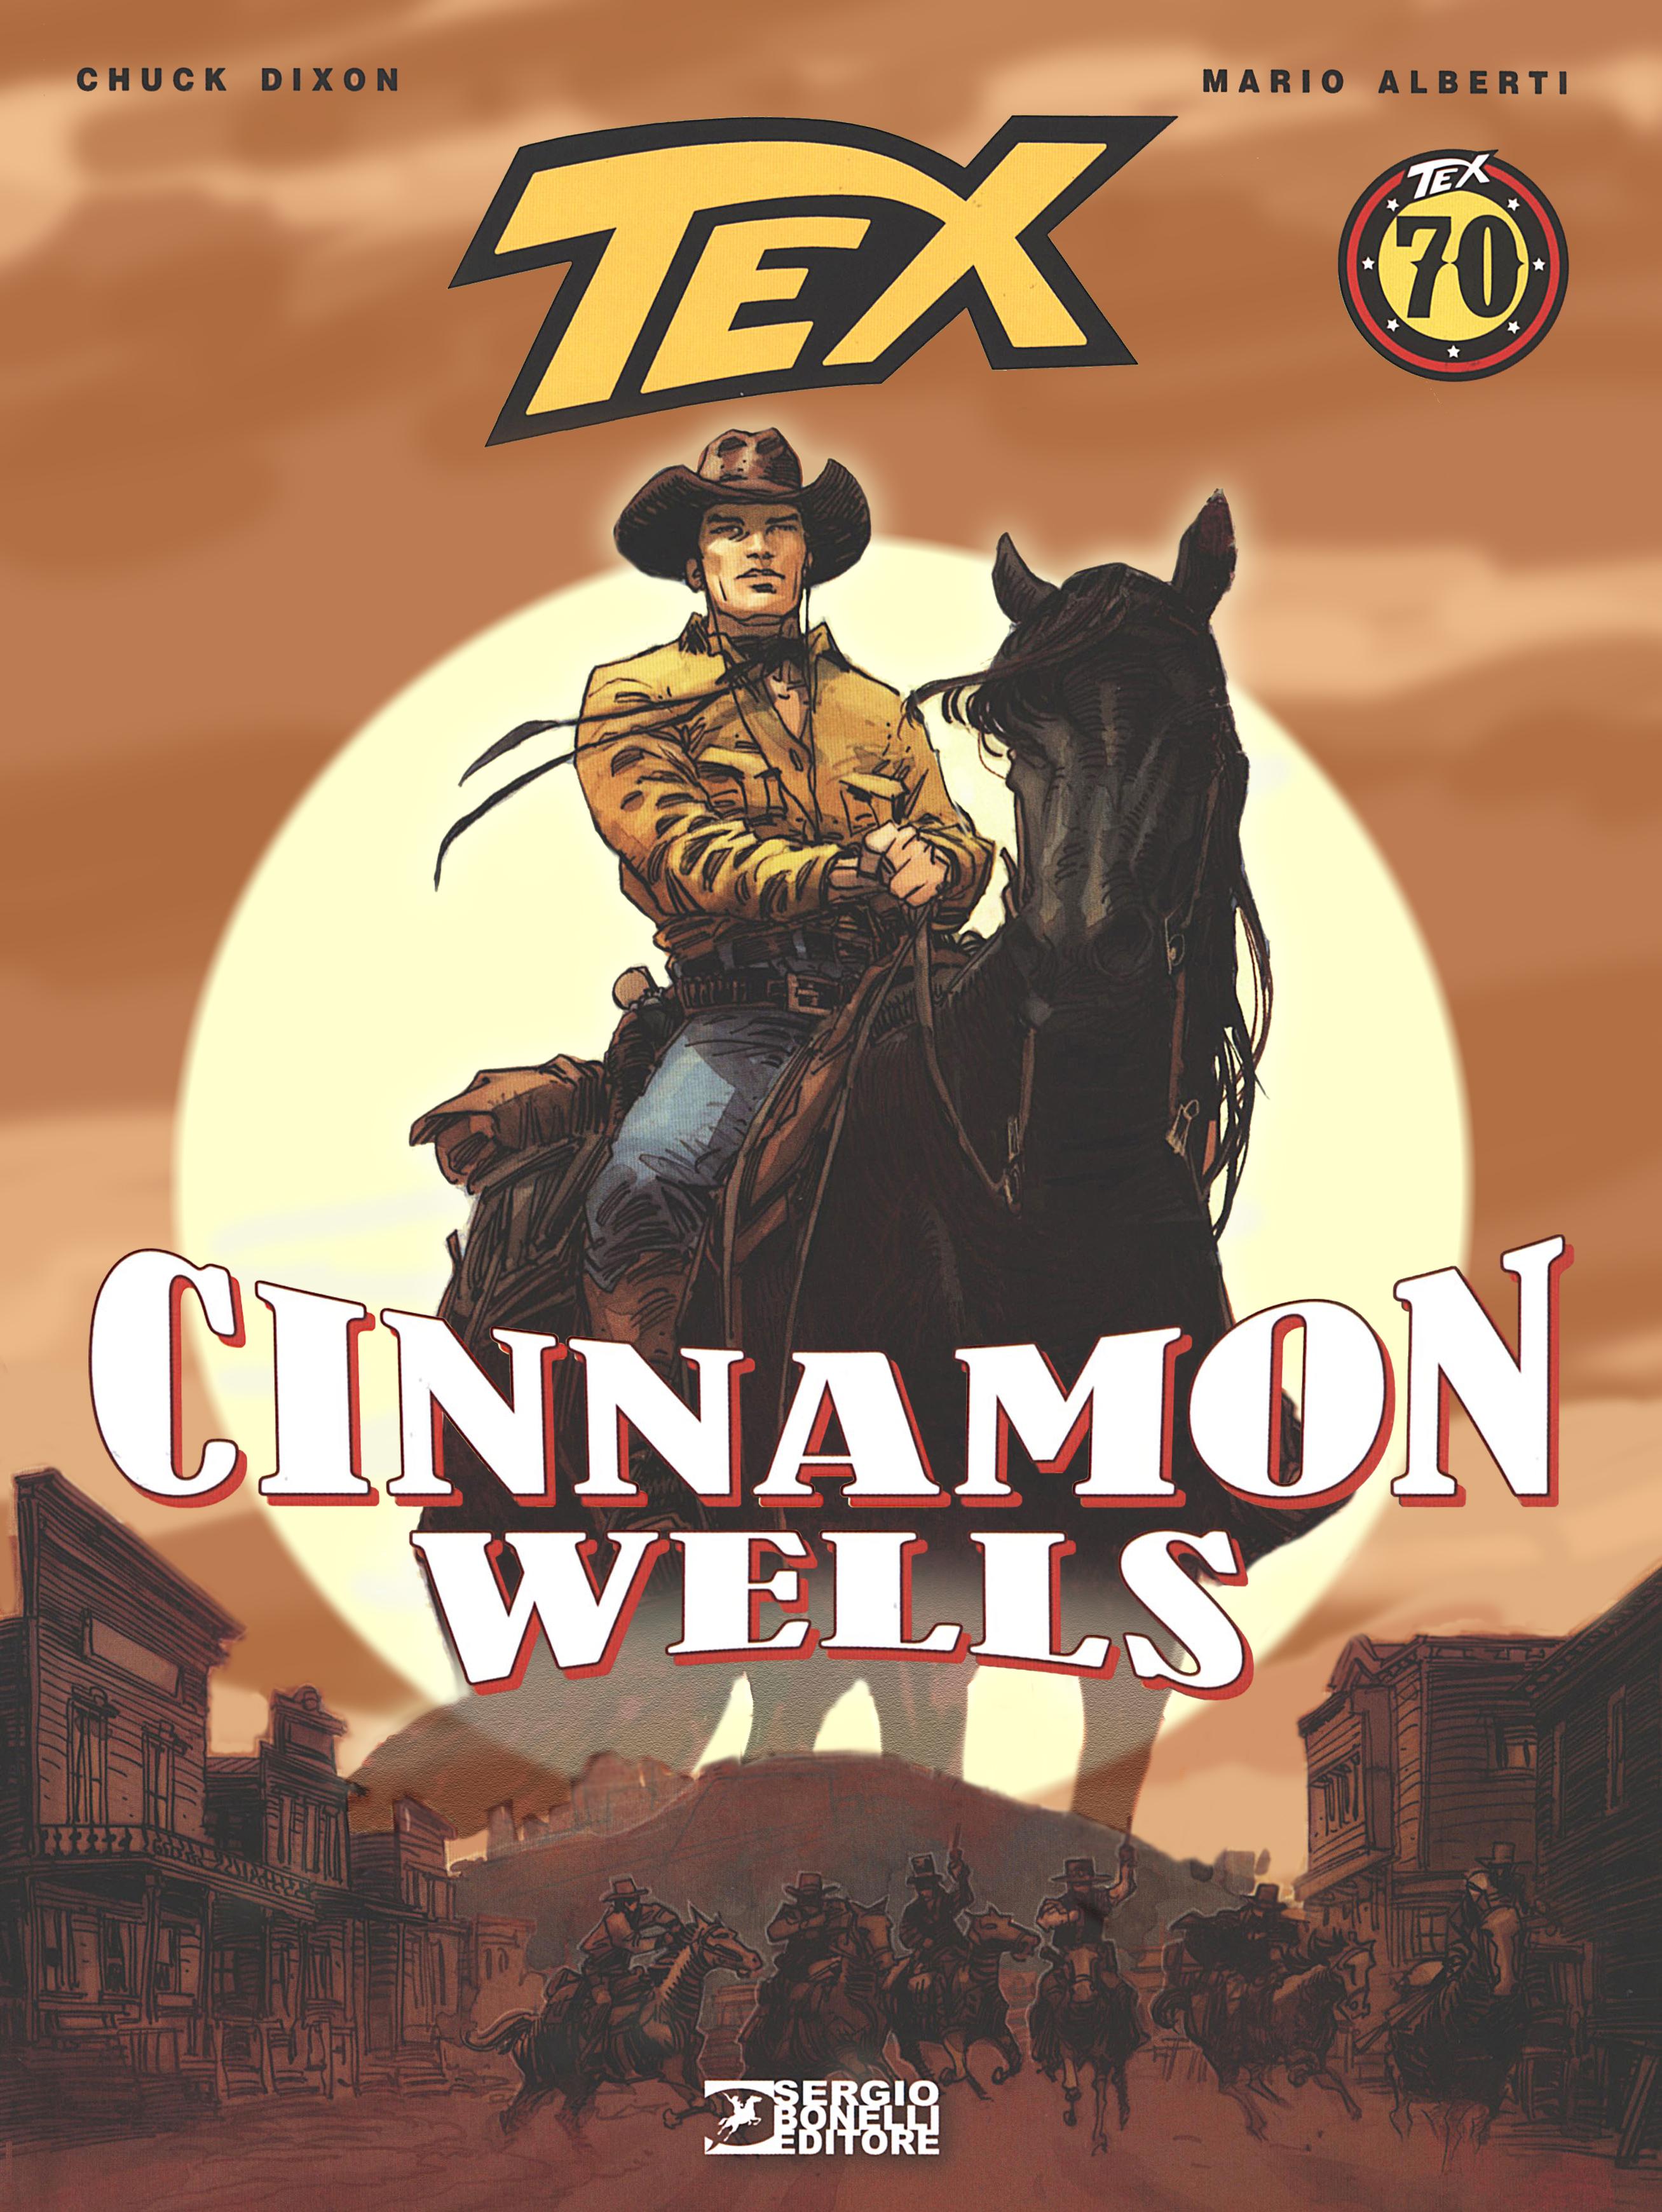 cinnamonwells.jpg